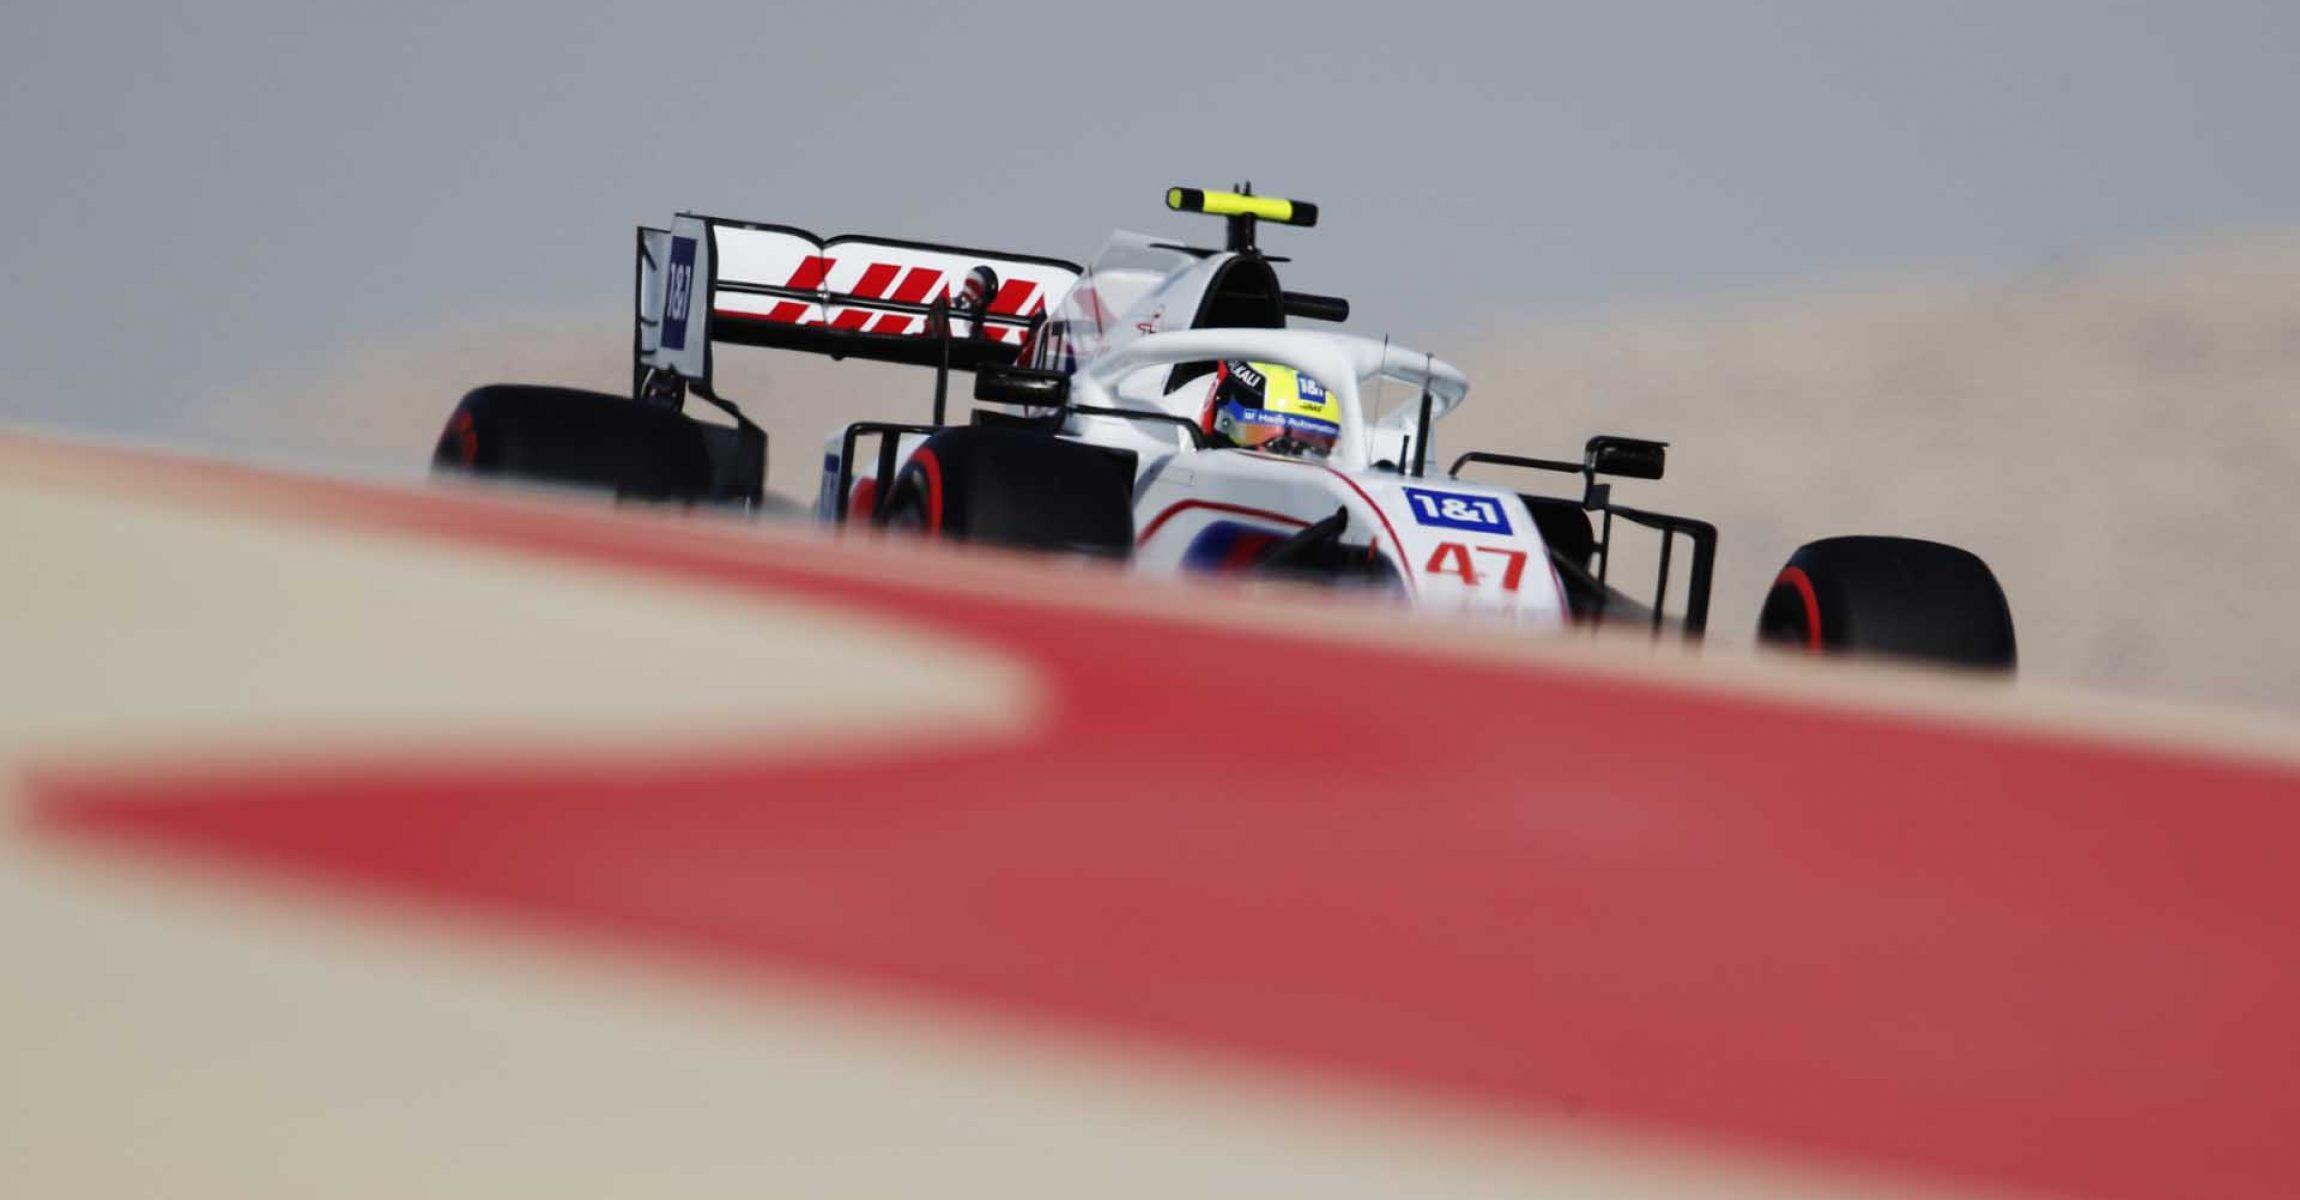 BAHRAIN INTERNATIONAL CIRCUIT, BAHRAIN - MARCH 26: Mick Schumacher, Haas VF-21 during the Bahrain GP at Bahrain International Circuit on Friday March 26, 2021 in Sakhir, Bahrain. (Photo by Zak Mauger / LAT Images)